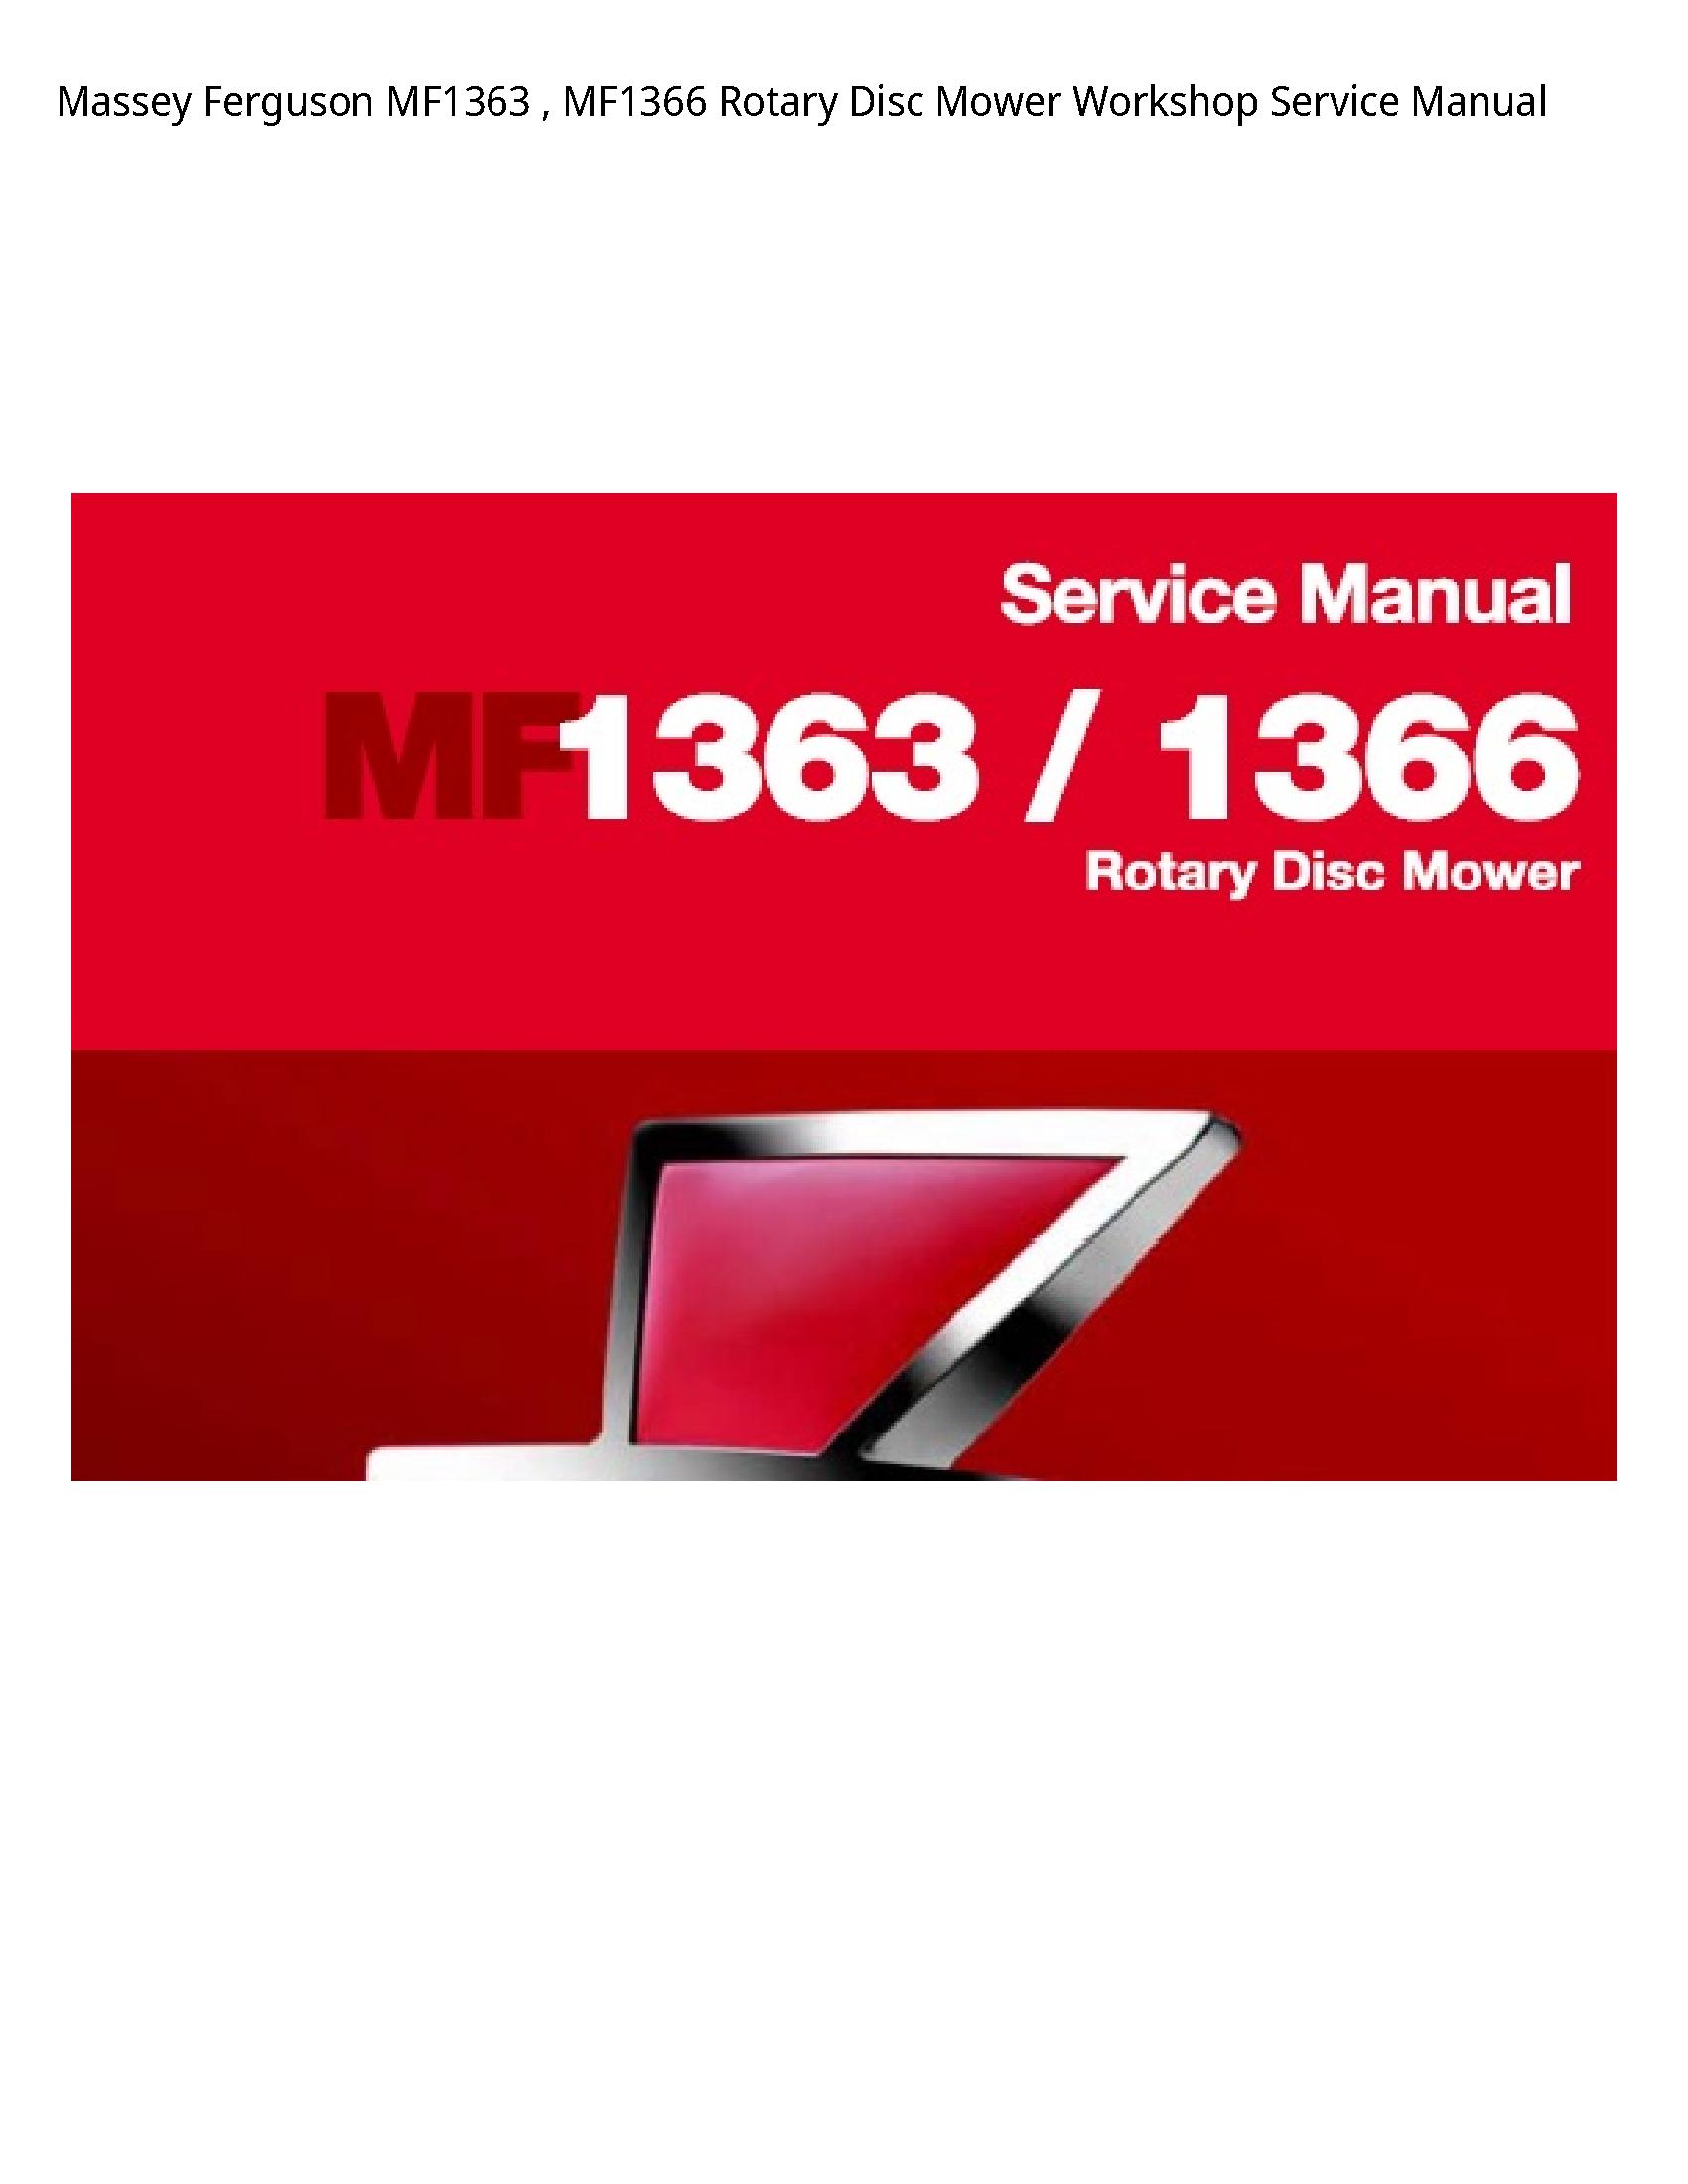 Massey Ferguson MF1363 Rotary Disc Mower Service manual